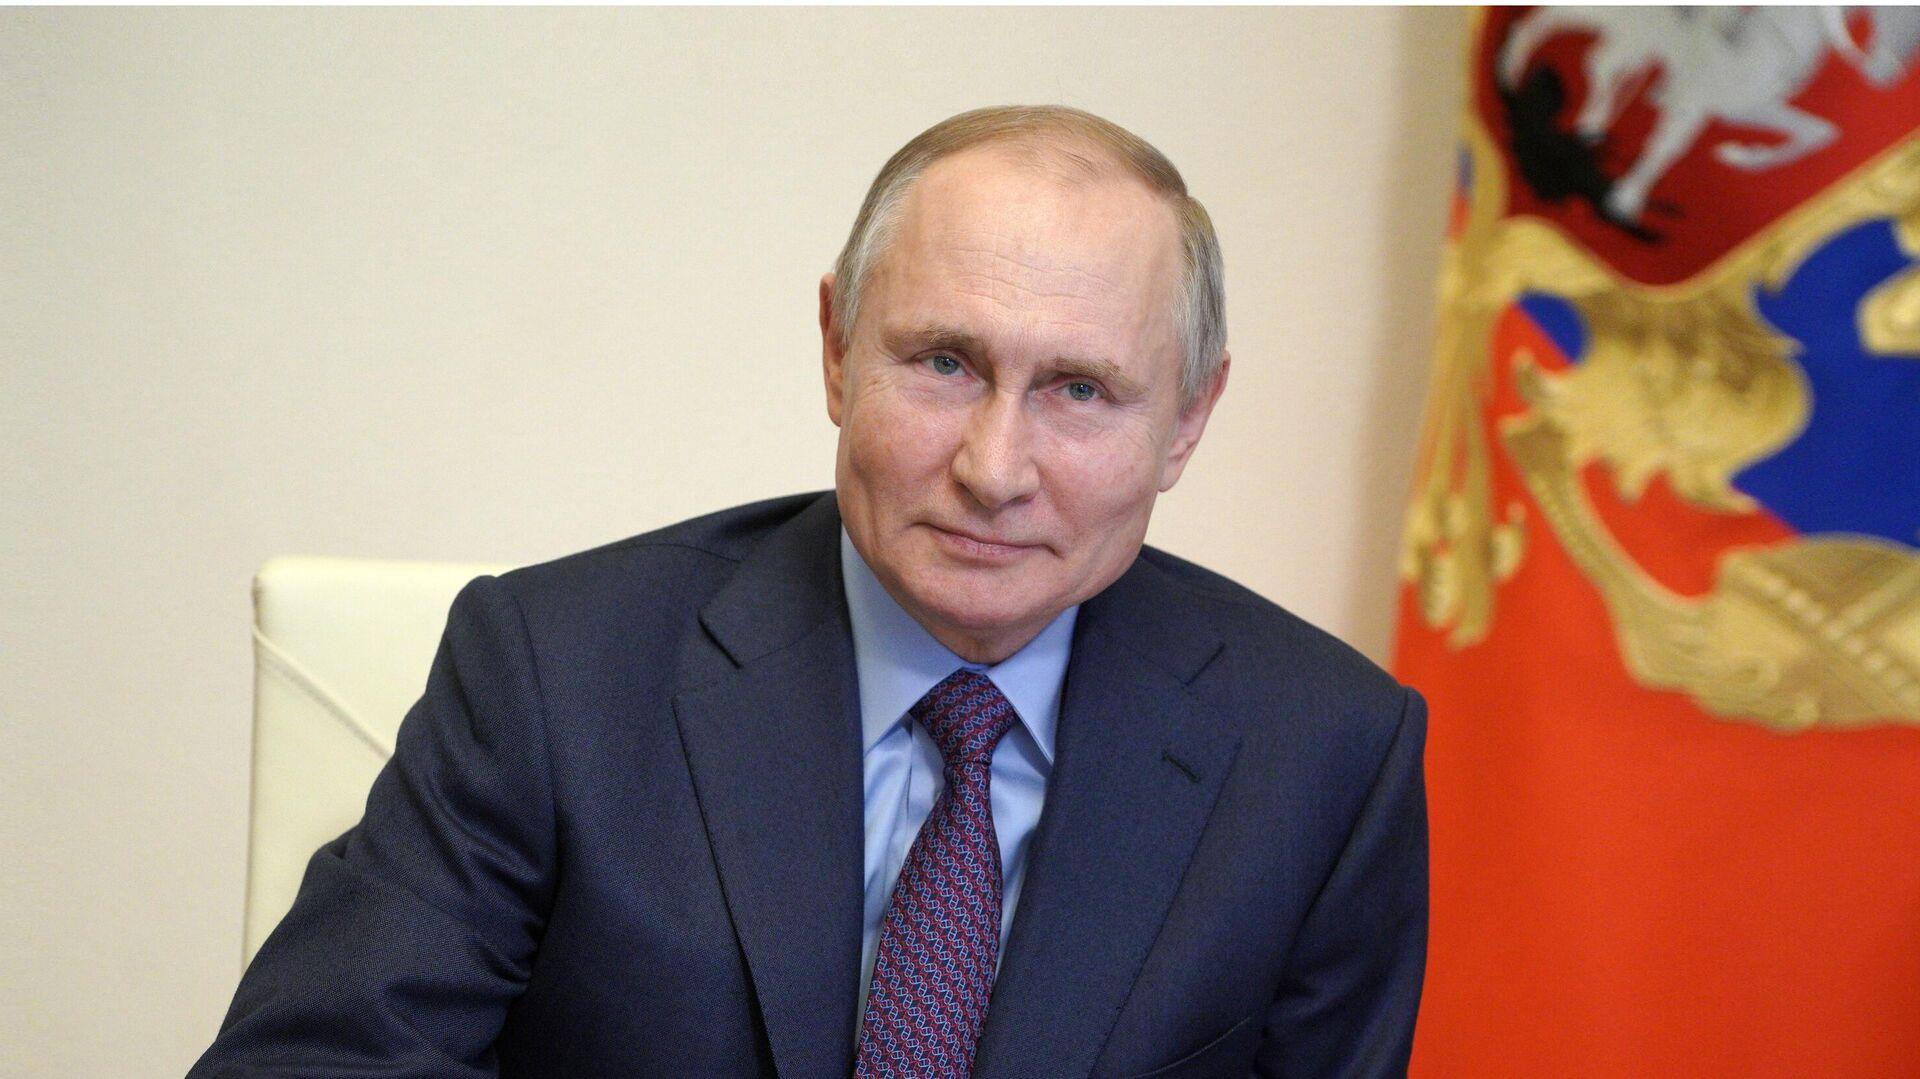 Президент РФ Владимир Путин проводит в режиме видеоконференции совещание по вопросам наращивания производства вакцин - РИА Новости, 1920, 22.03.2021